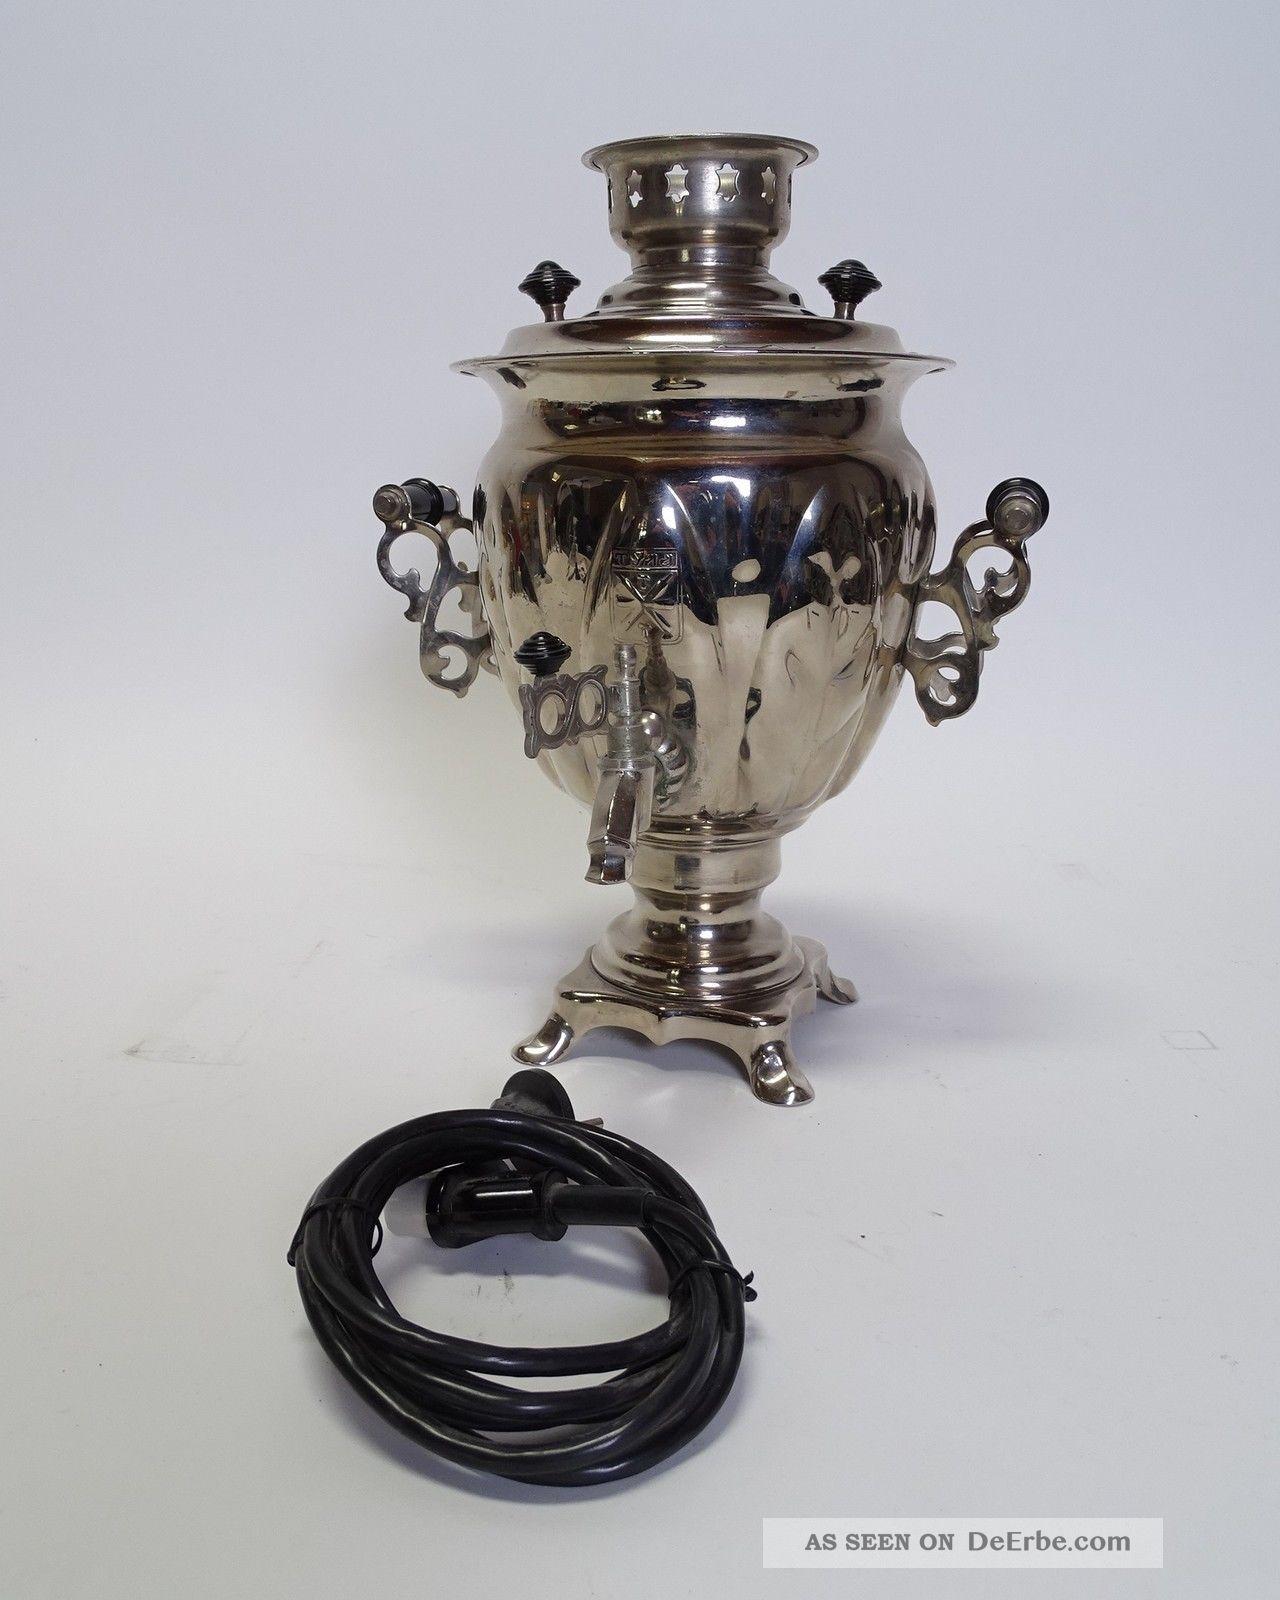 Antiker Russischer Samowar Dröppelminna Teekocher Wasserkocher Mit Kabel Gefertigt nach 1945 Bild